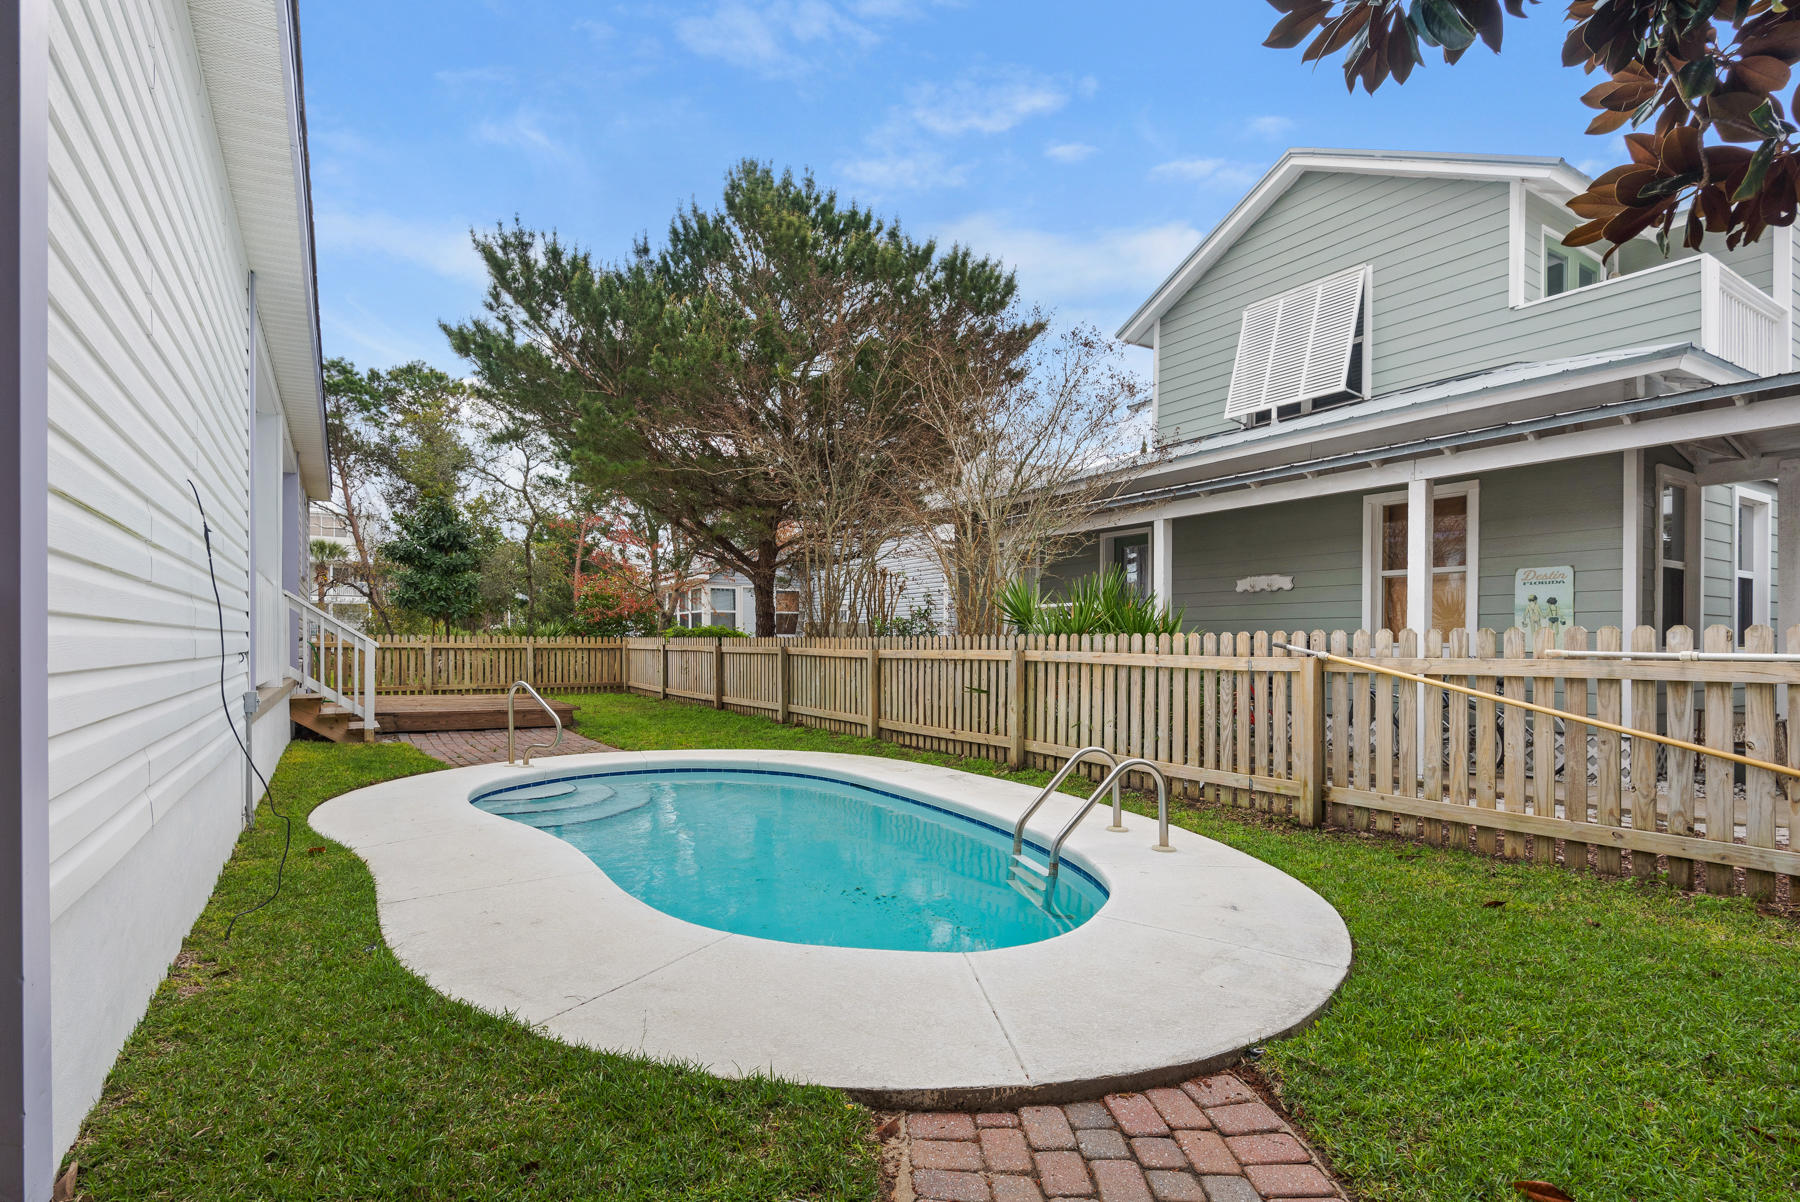 Photo of home for sale at 4496 Luke, Destin FL